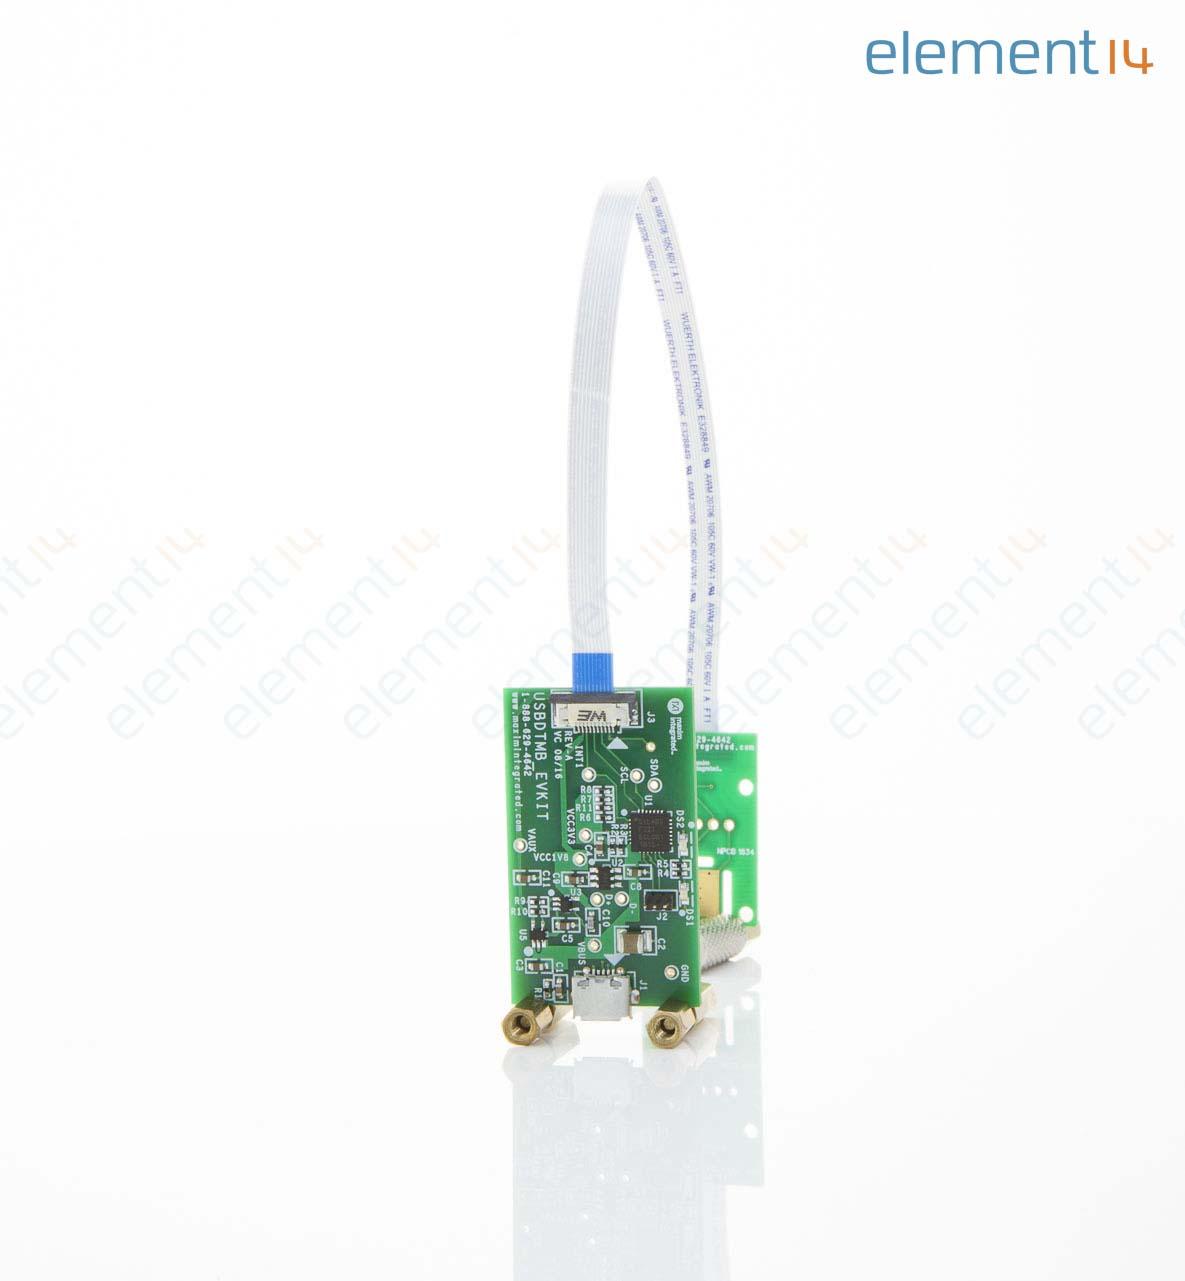 Evaluation Kit, MAX30105 Human Body Temperature Sensor, Smoke Detection  Applications